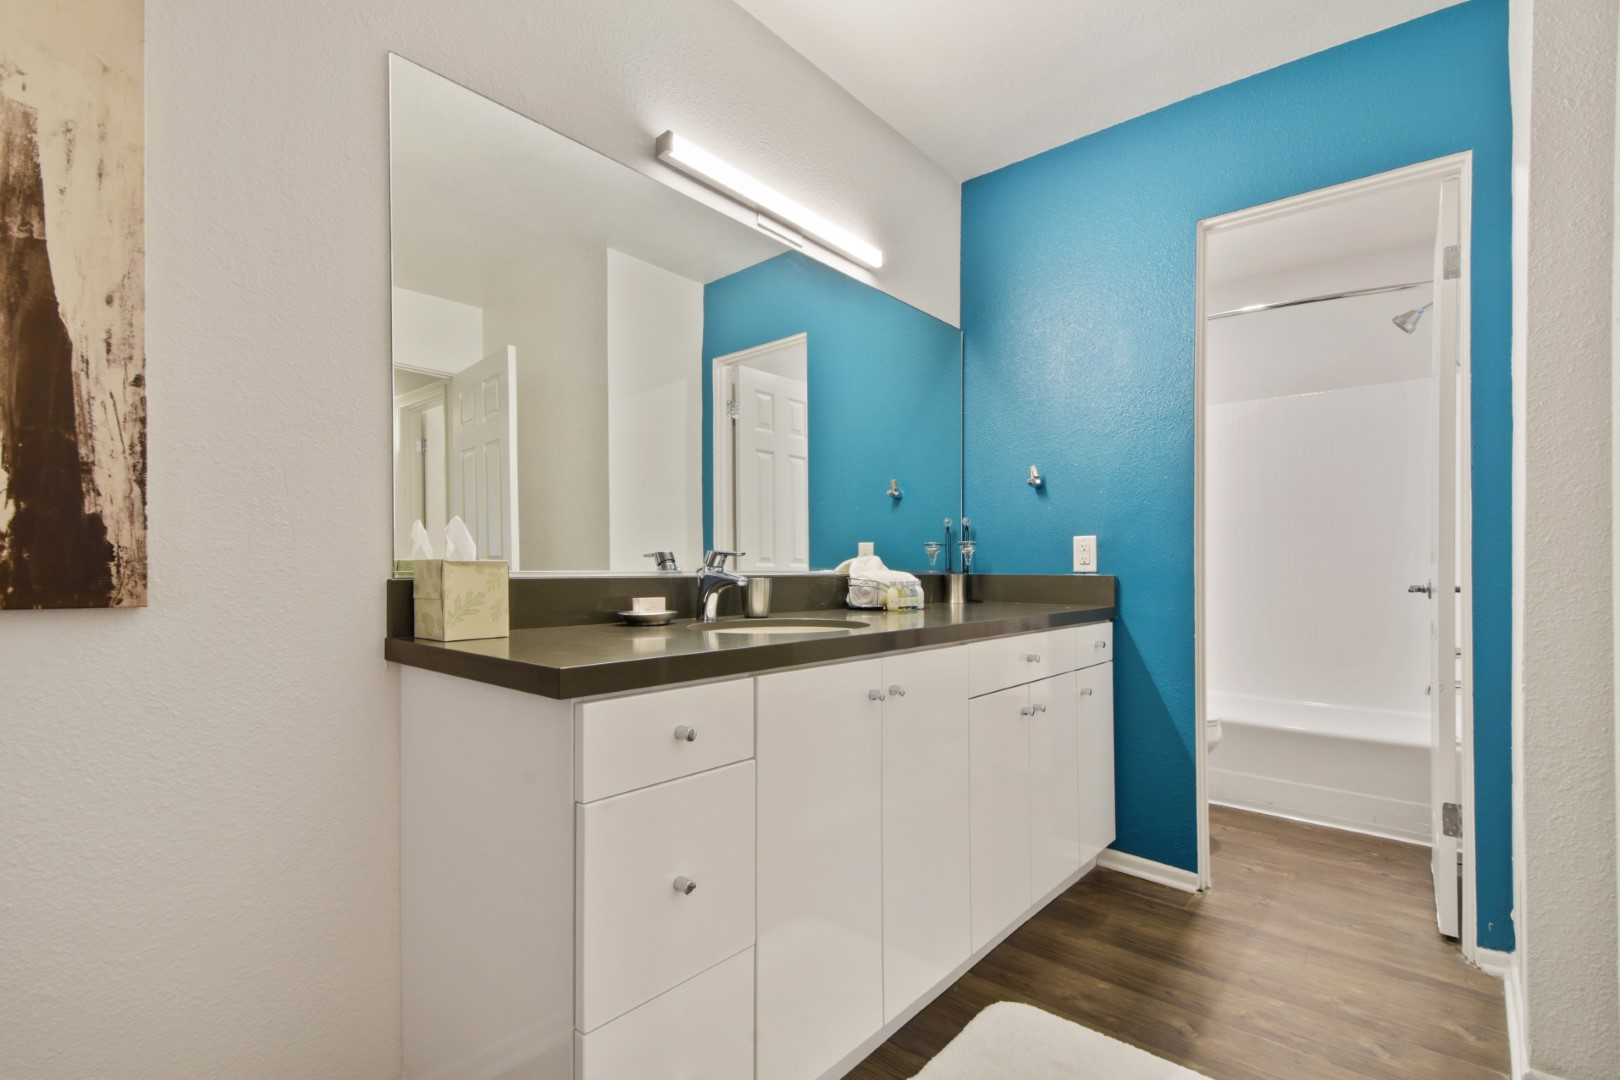 Bathroom at Ava Toluca Hills Apartments, Toluca Lake, Los Angeles